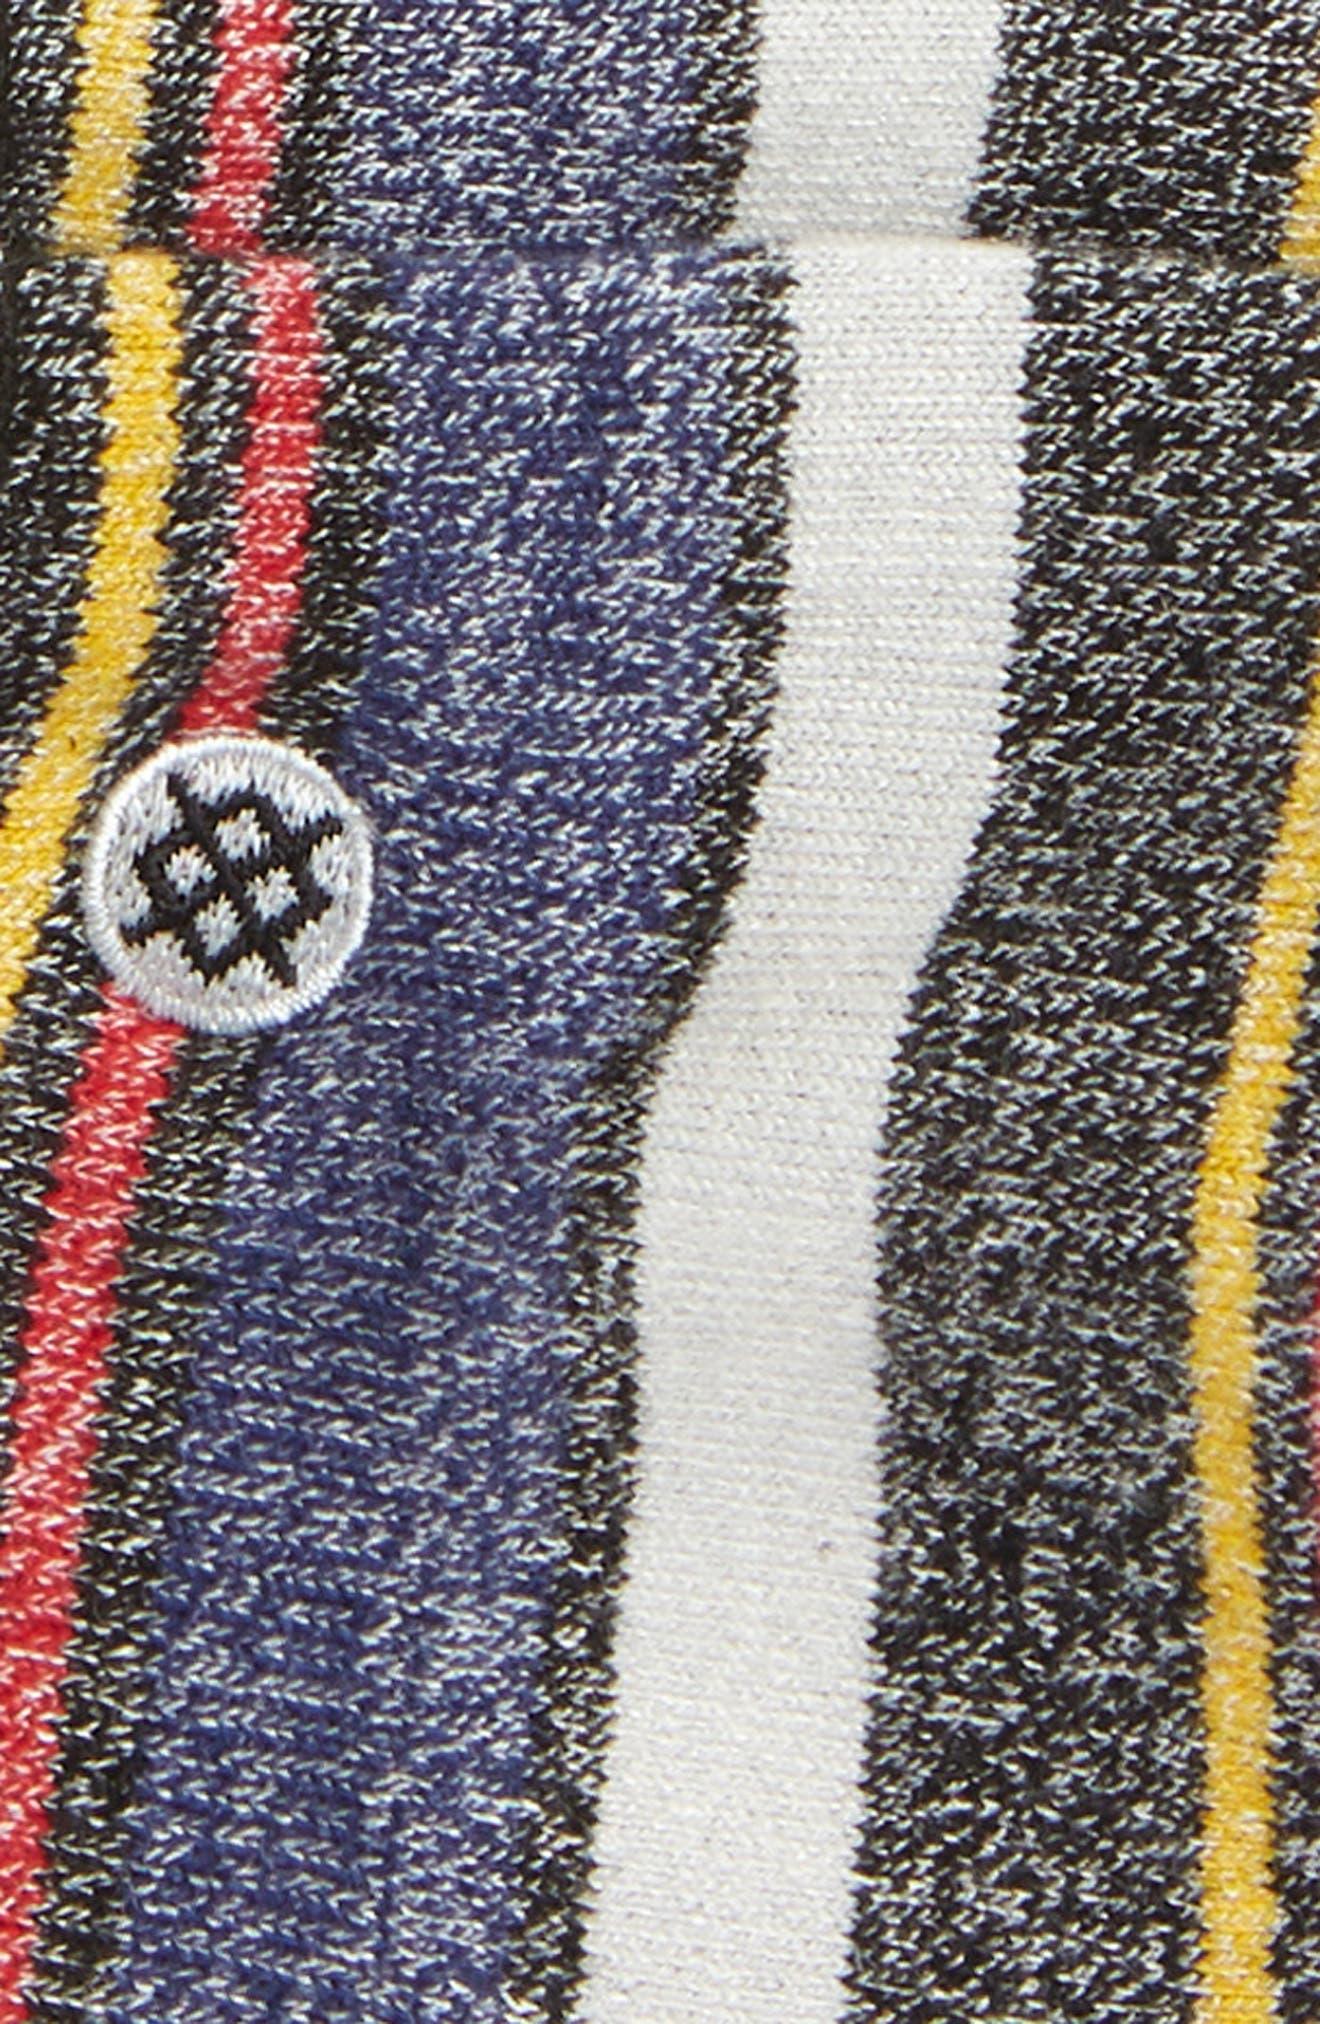 Keating Low Socks,                             Alternate thumbnail 2, color,                             BLACK